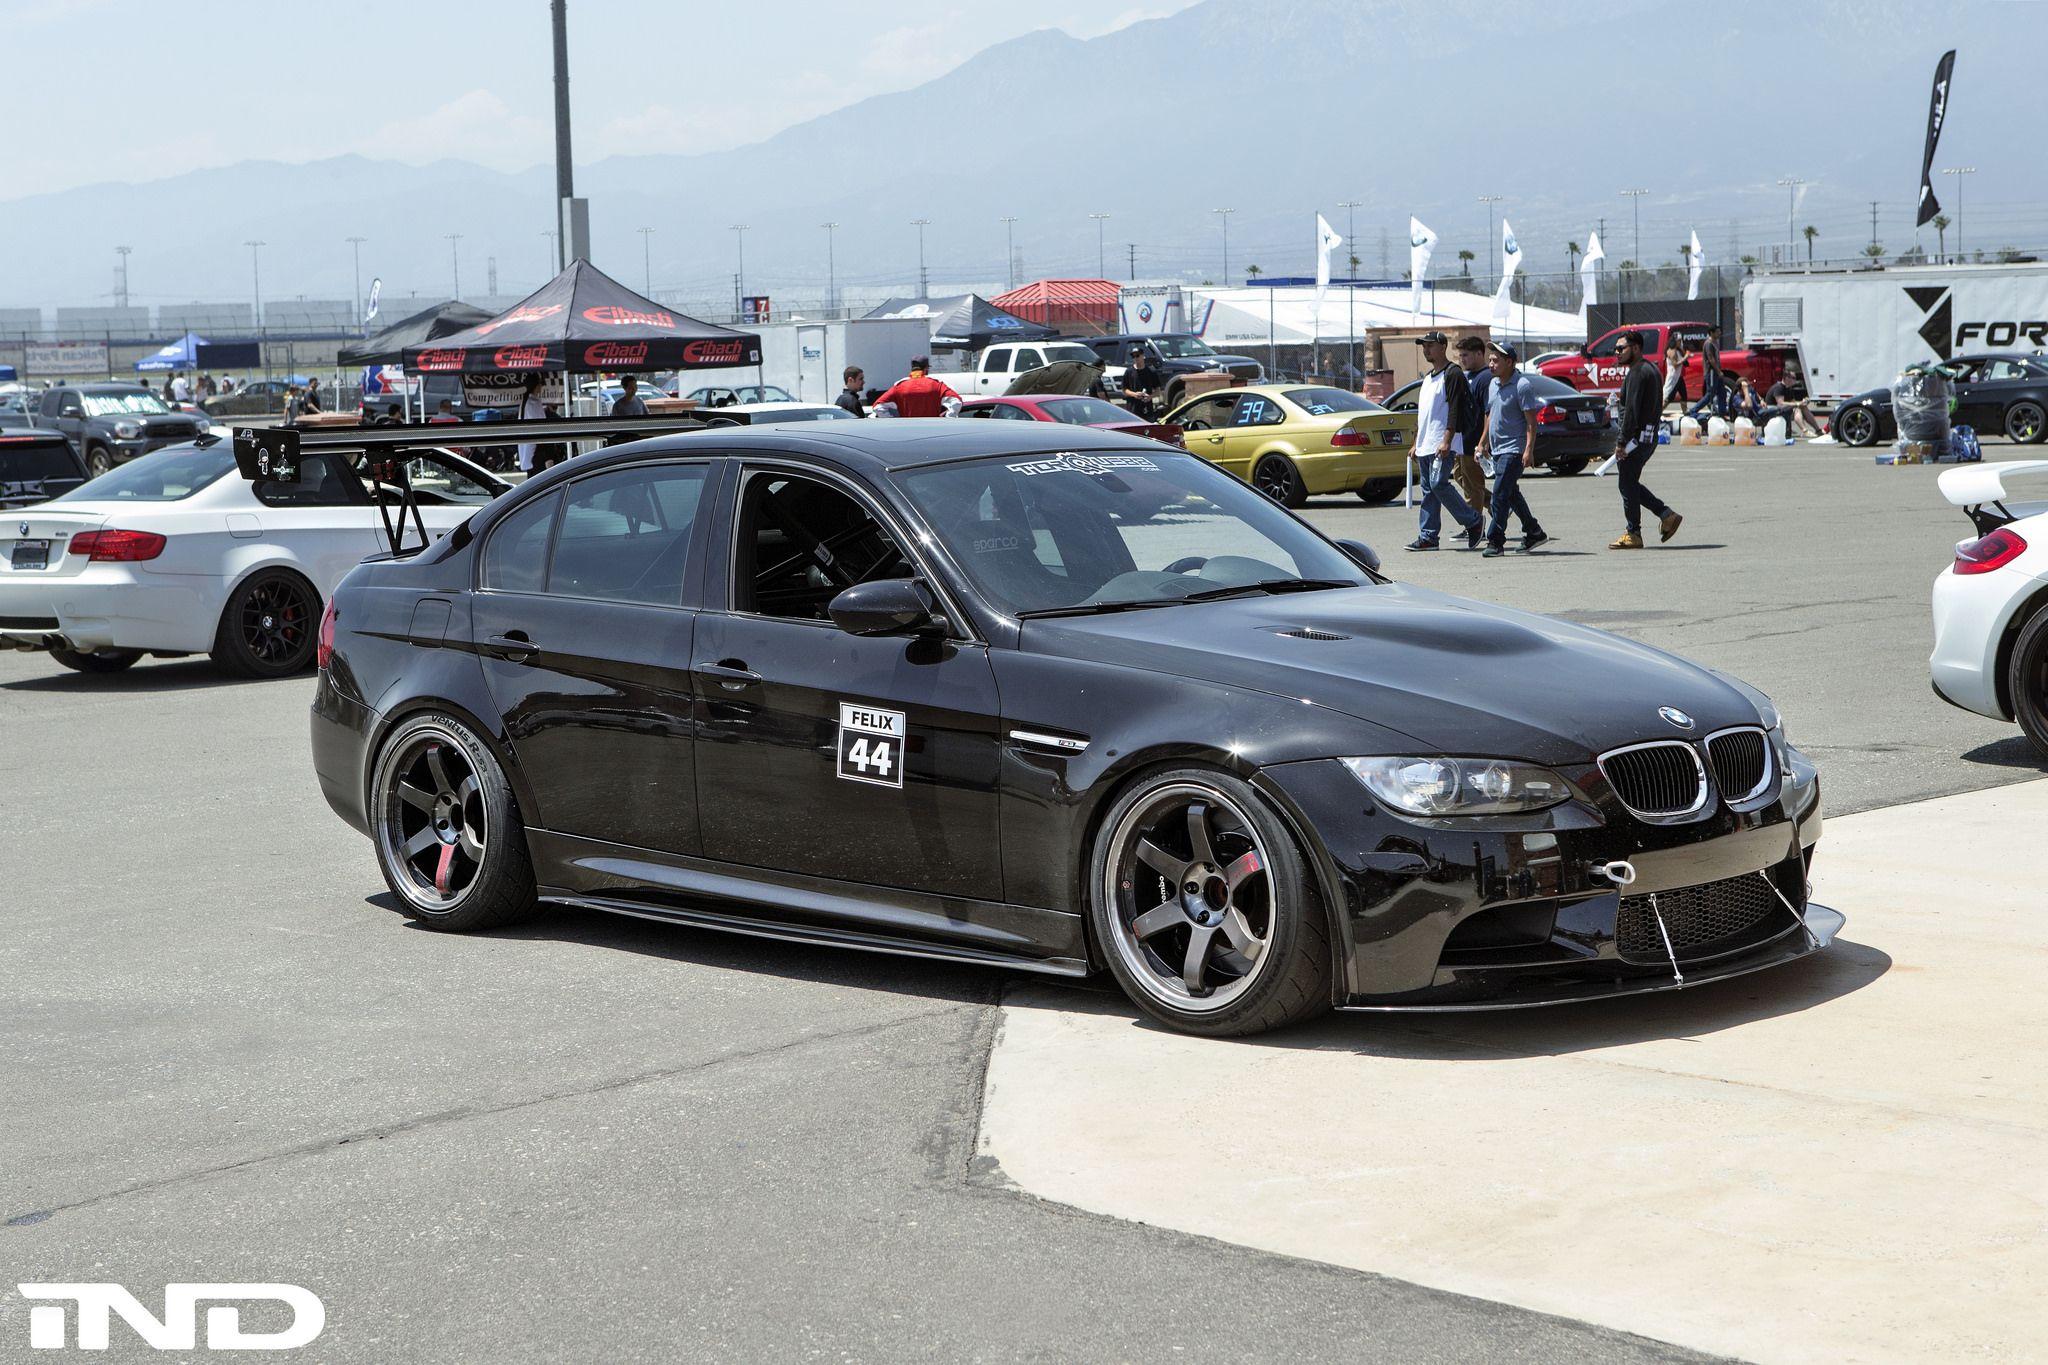 BMW E90 M3 Sedan BimmerFest 2k16 iND Tuning Black Pearl